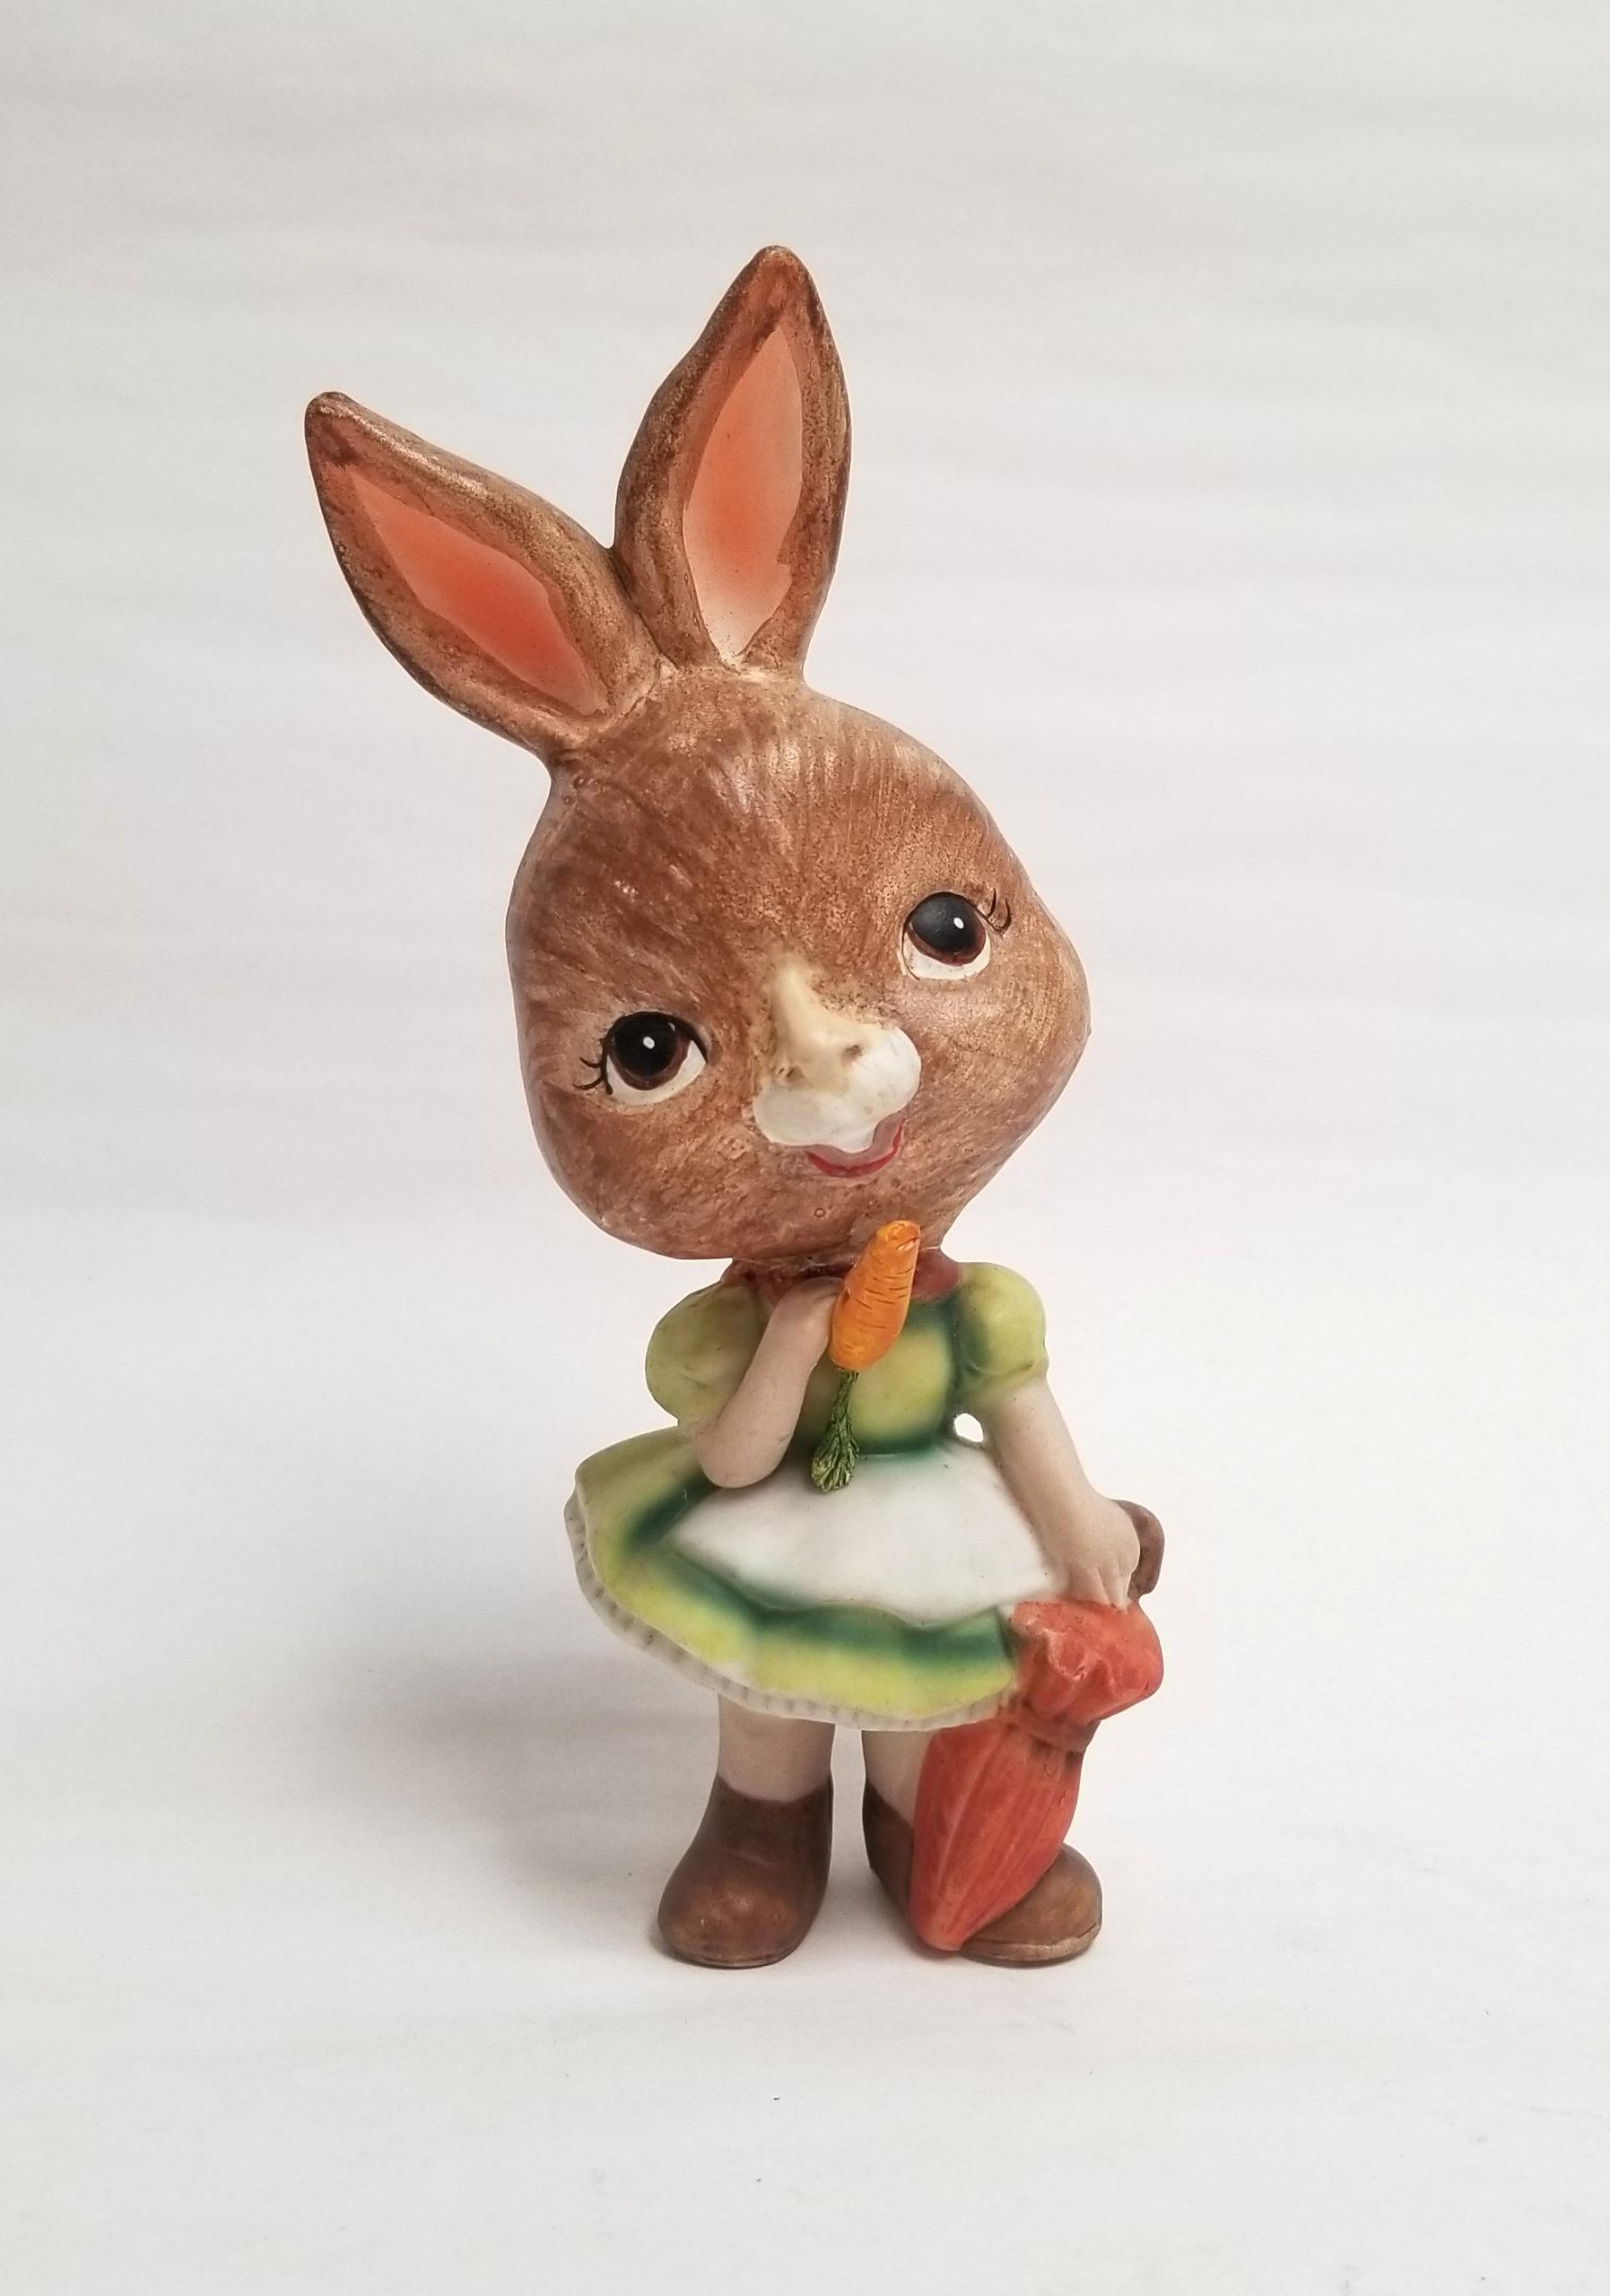 "Debra Broz, Rabbit Girl, 2021 Mixed media on secondhand ceramic figurines 6 ½"" x 3"" x 3"""